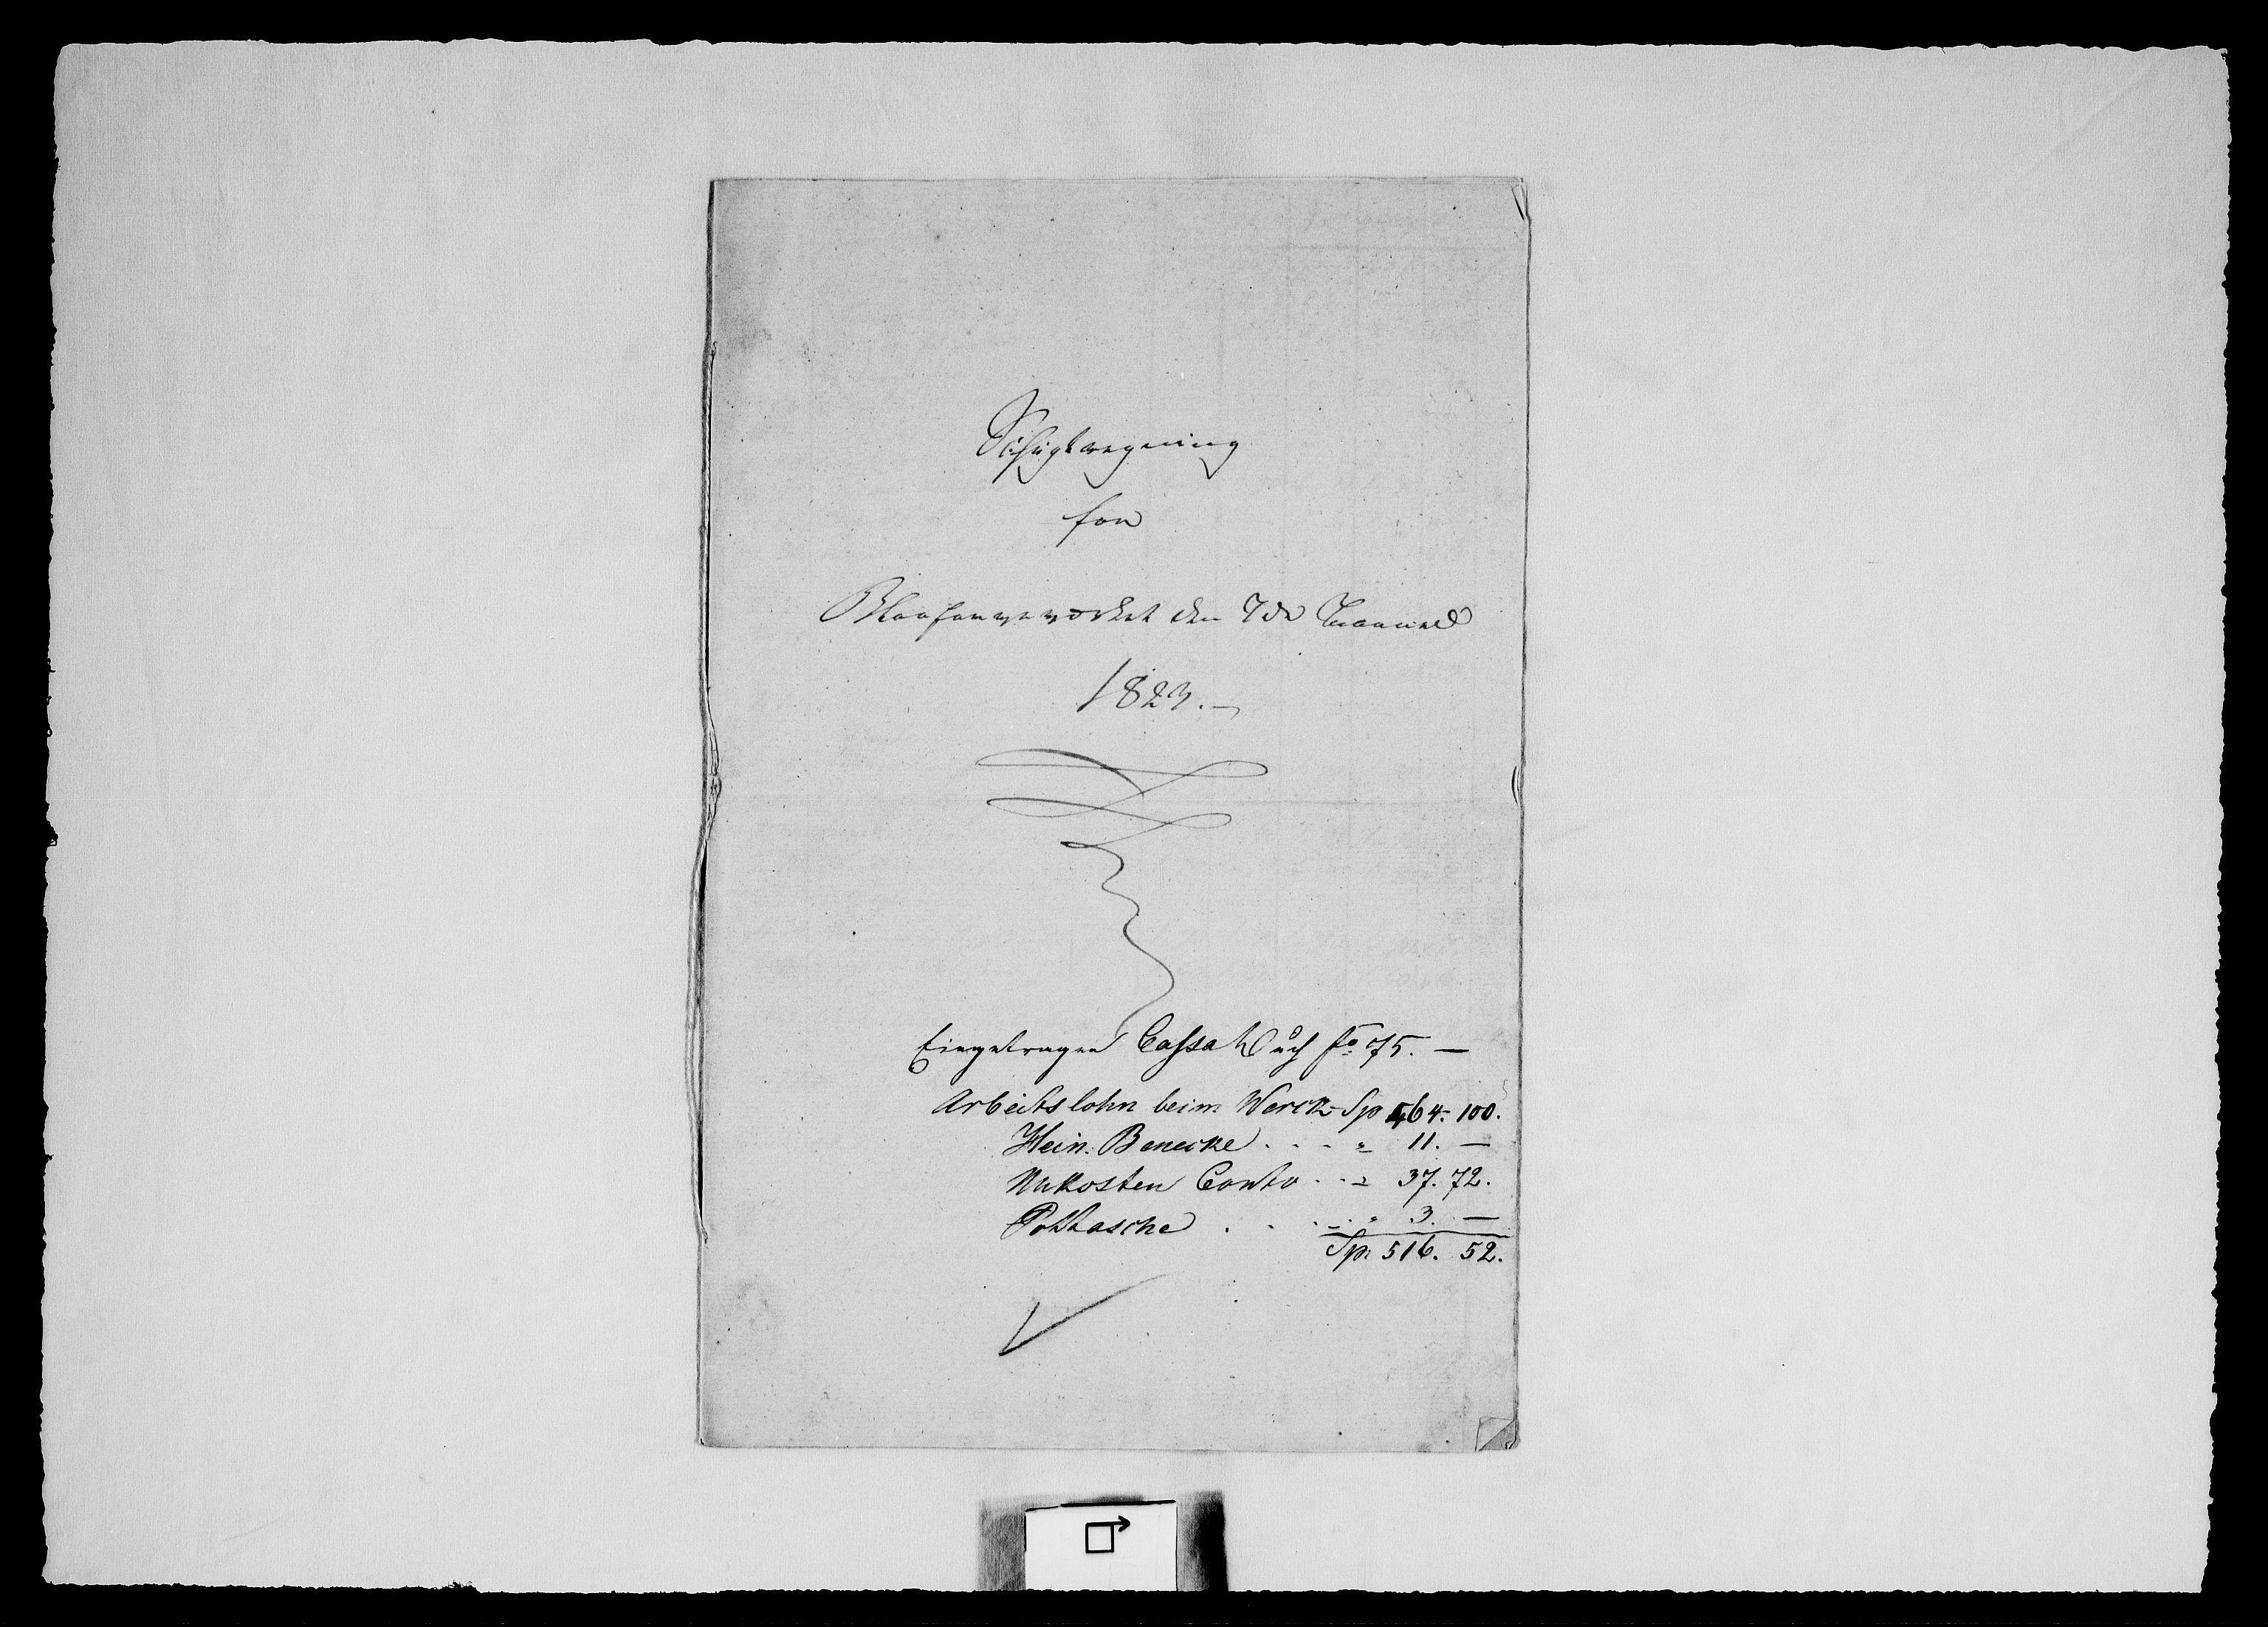 RA, Modums Blaafarveværk, G/Gd/Gdd/L0251, 1823-1826, s. 2